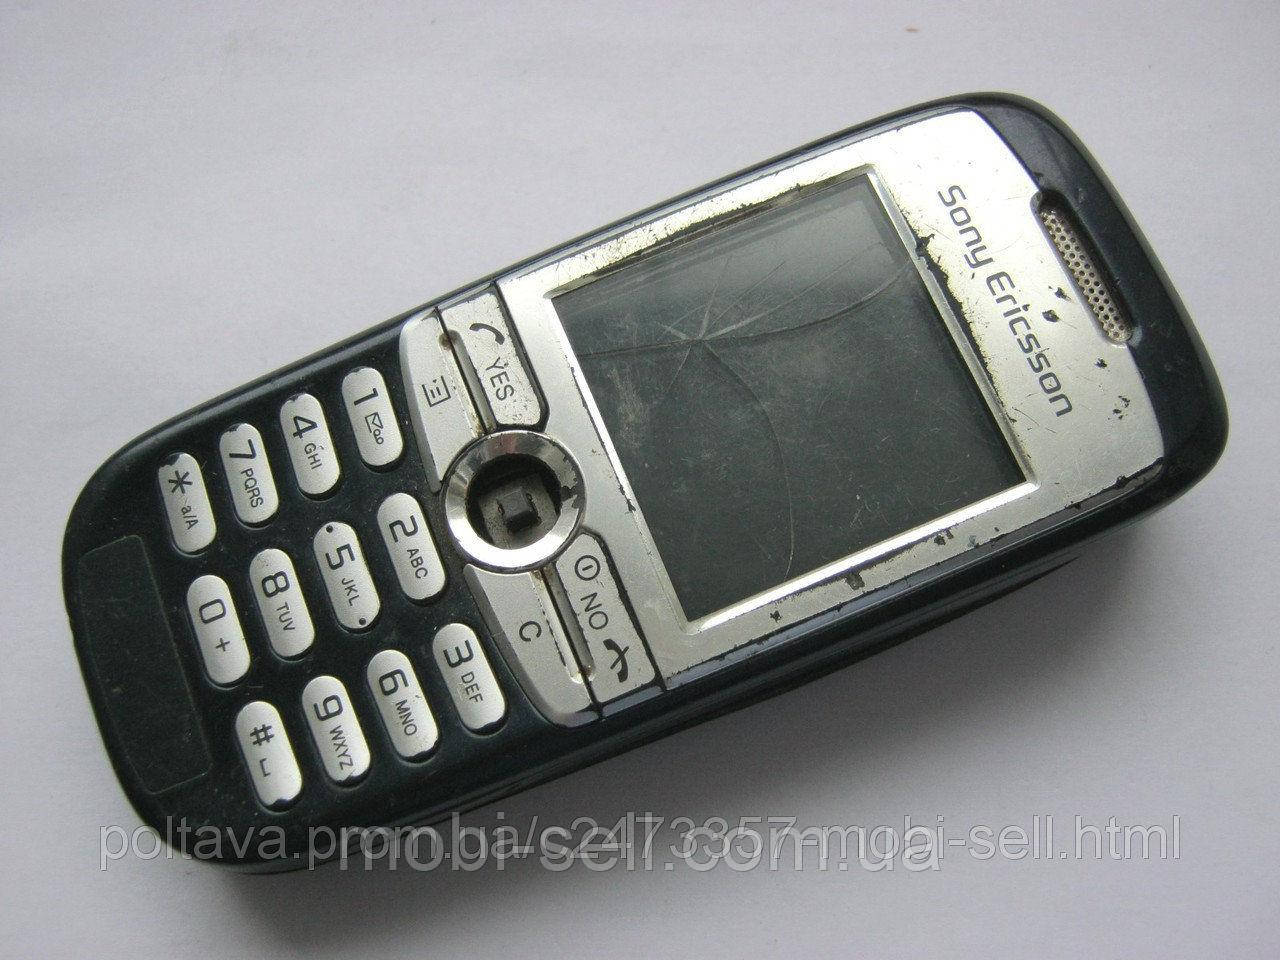 Sony Ericsson J200 на запчасти (корпус,динамик, кнопки, джойстик)